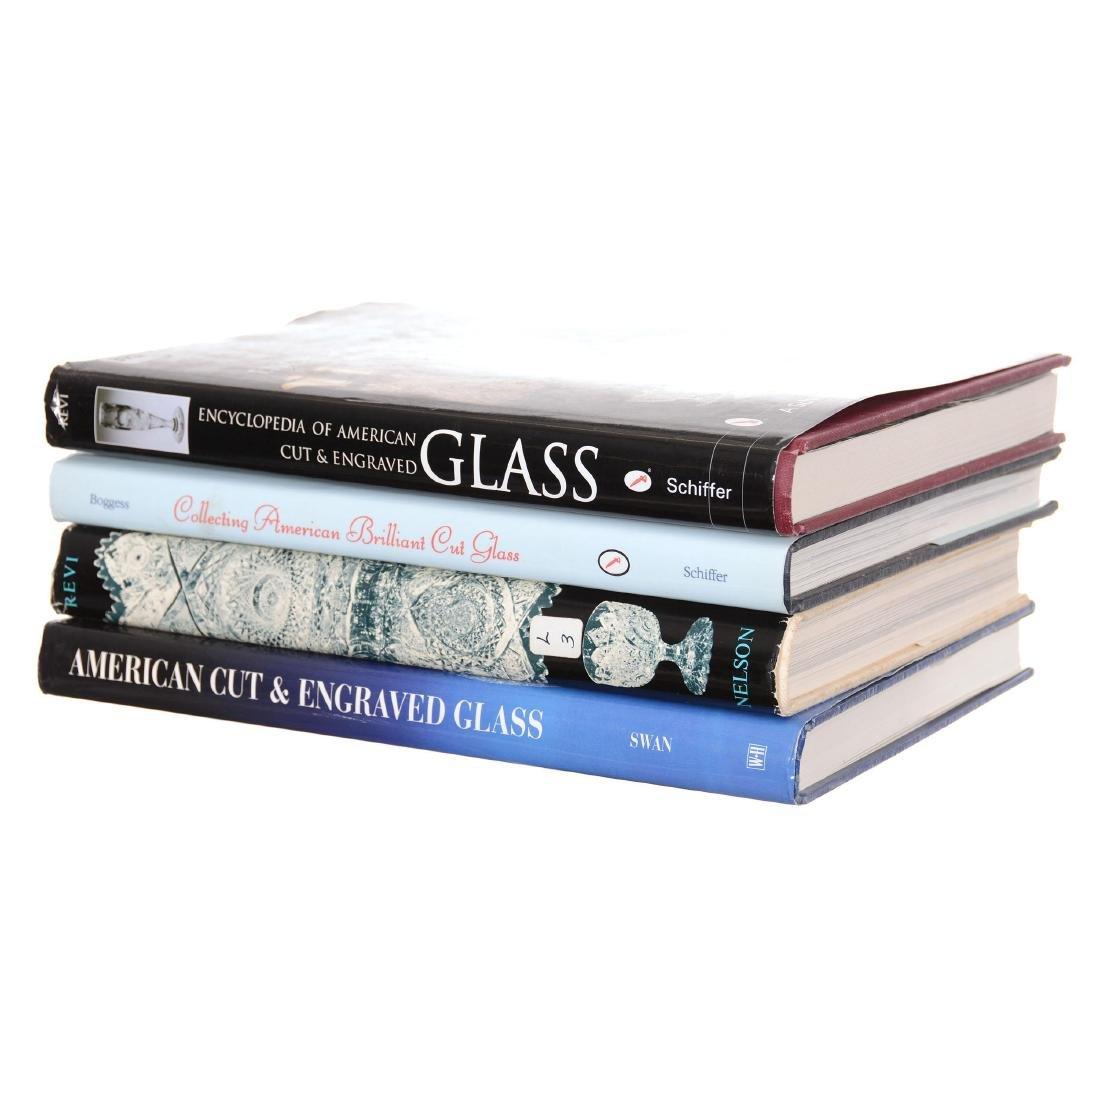 (4) Books